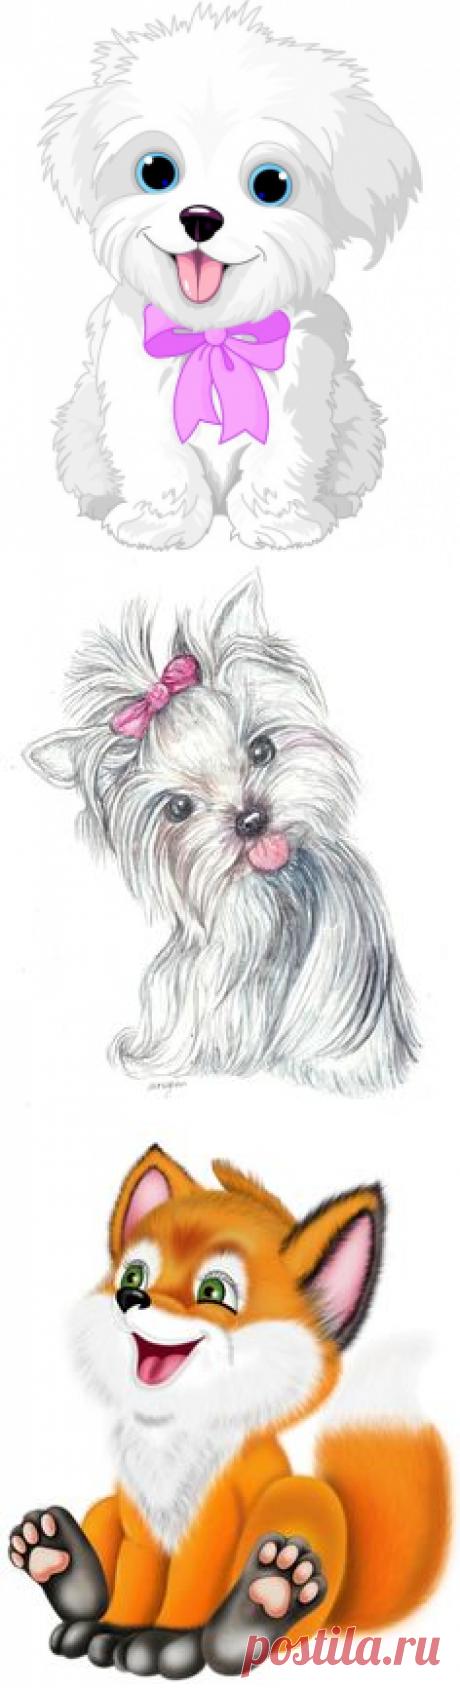 (6) Panting Puppy